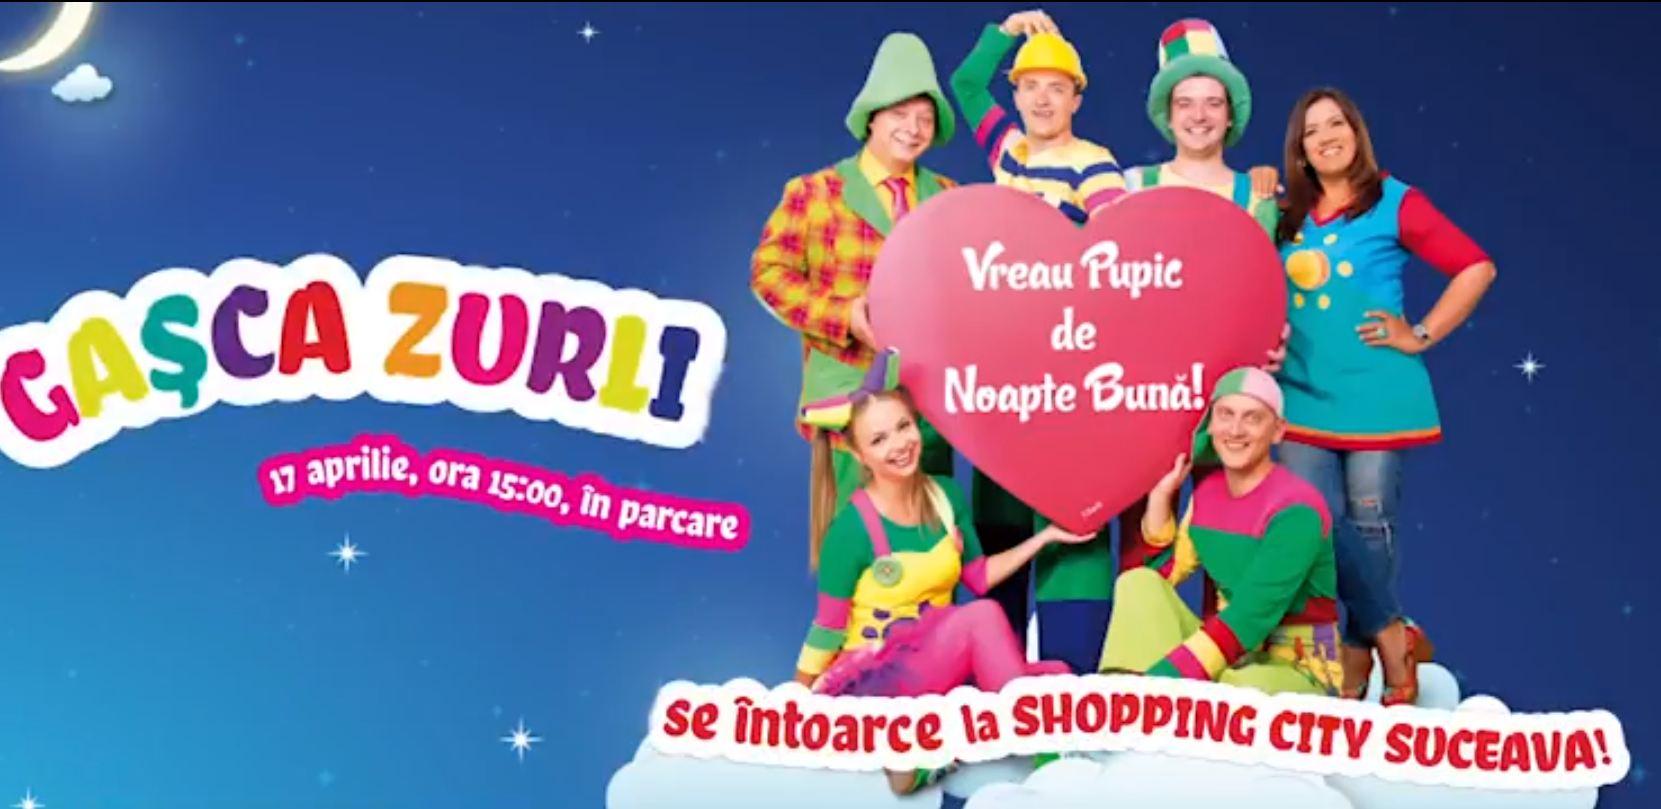 Gasca Zurli la Shopping City Suceava